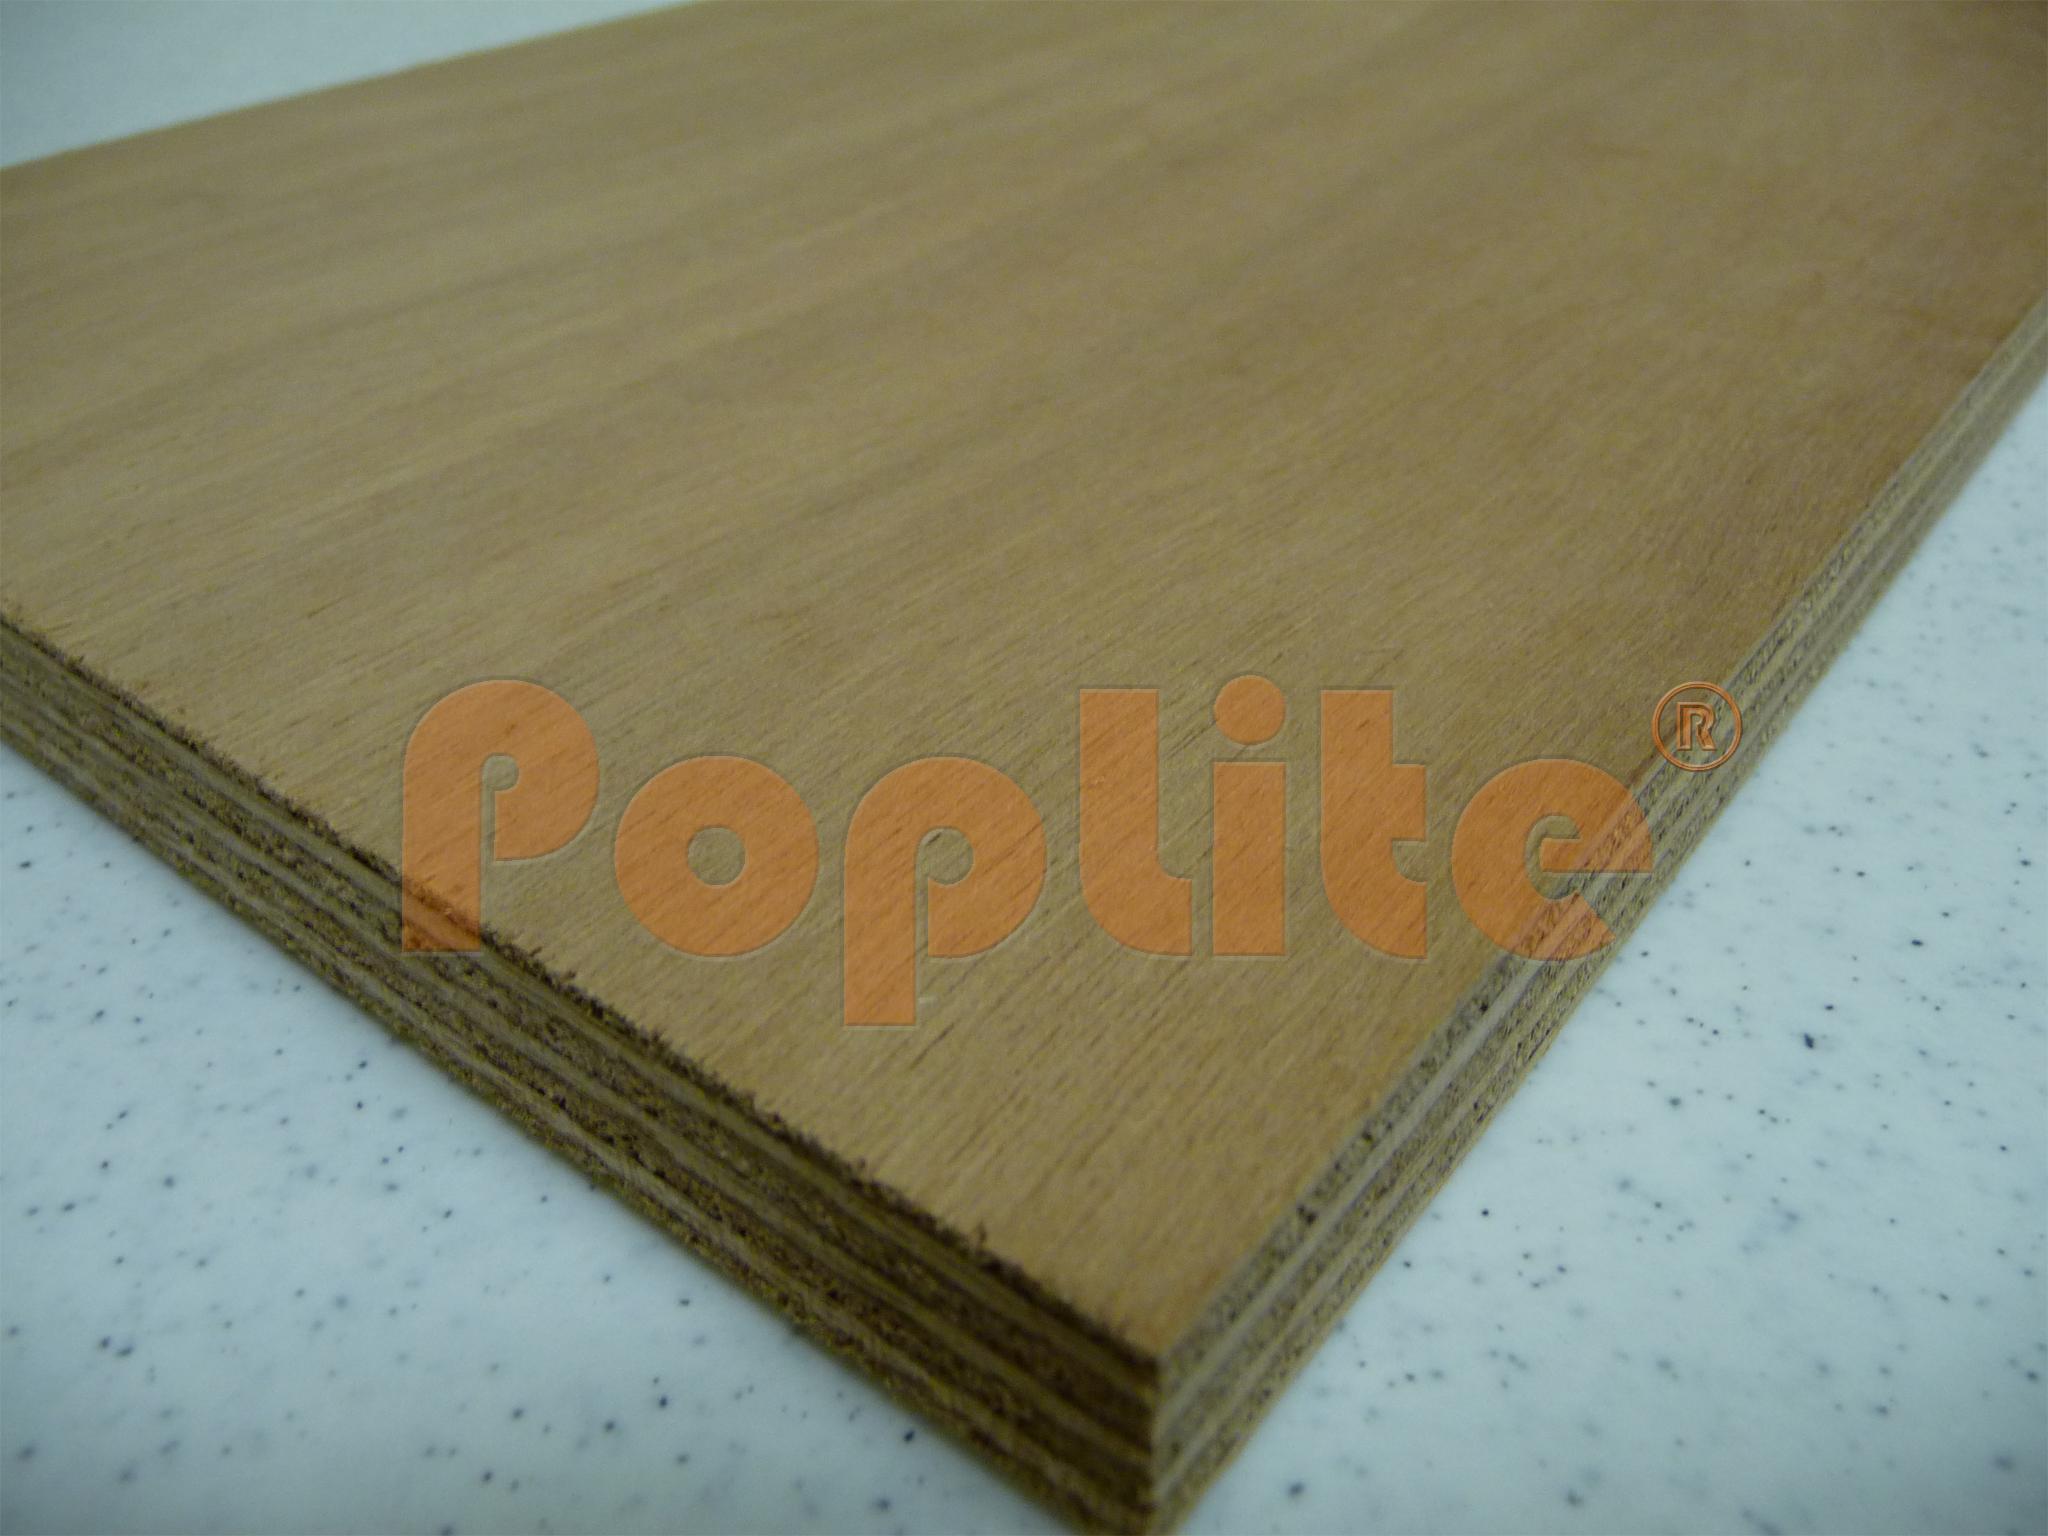 Poplite Products